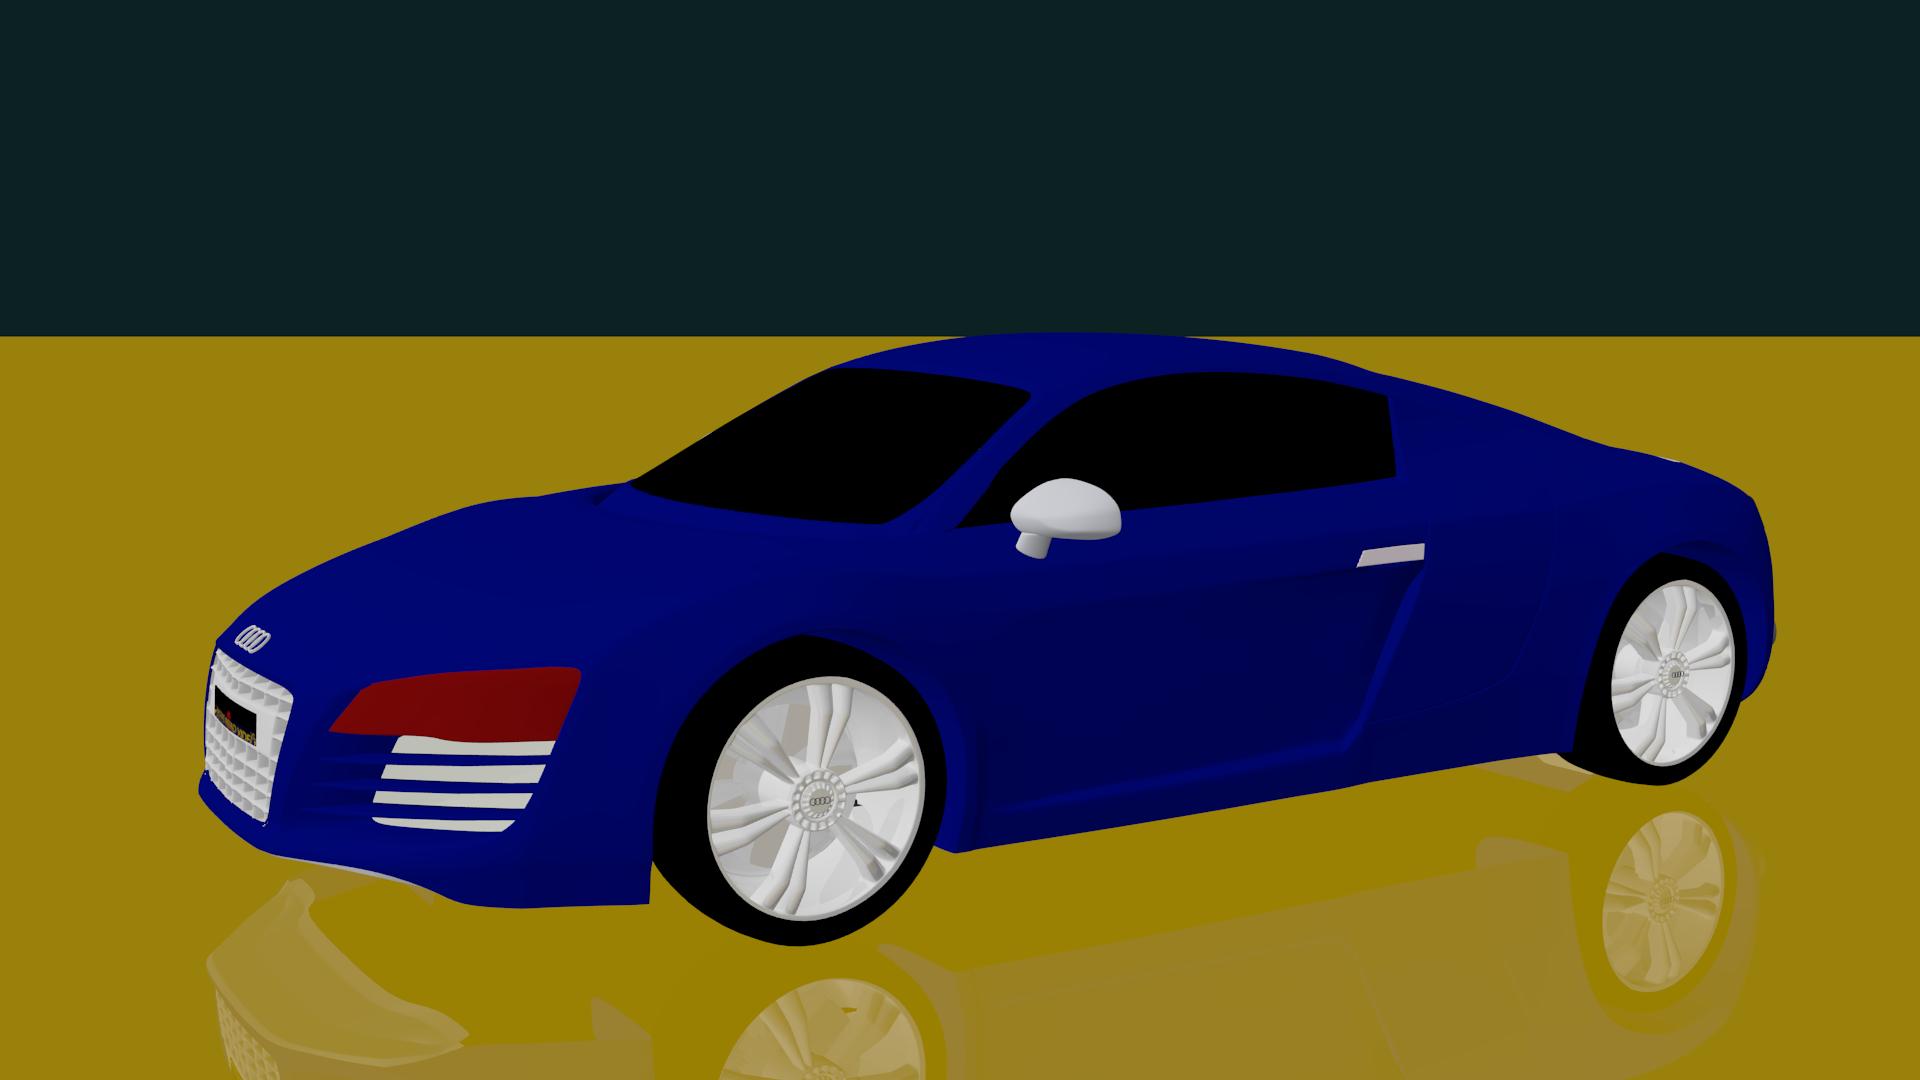 I can make 3D car model for you